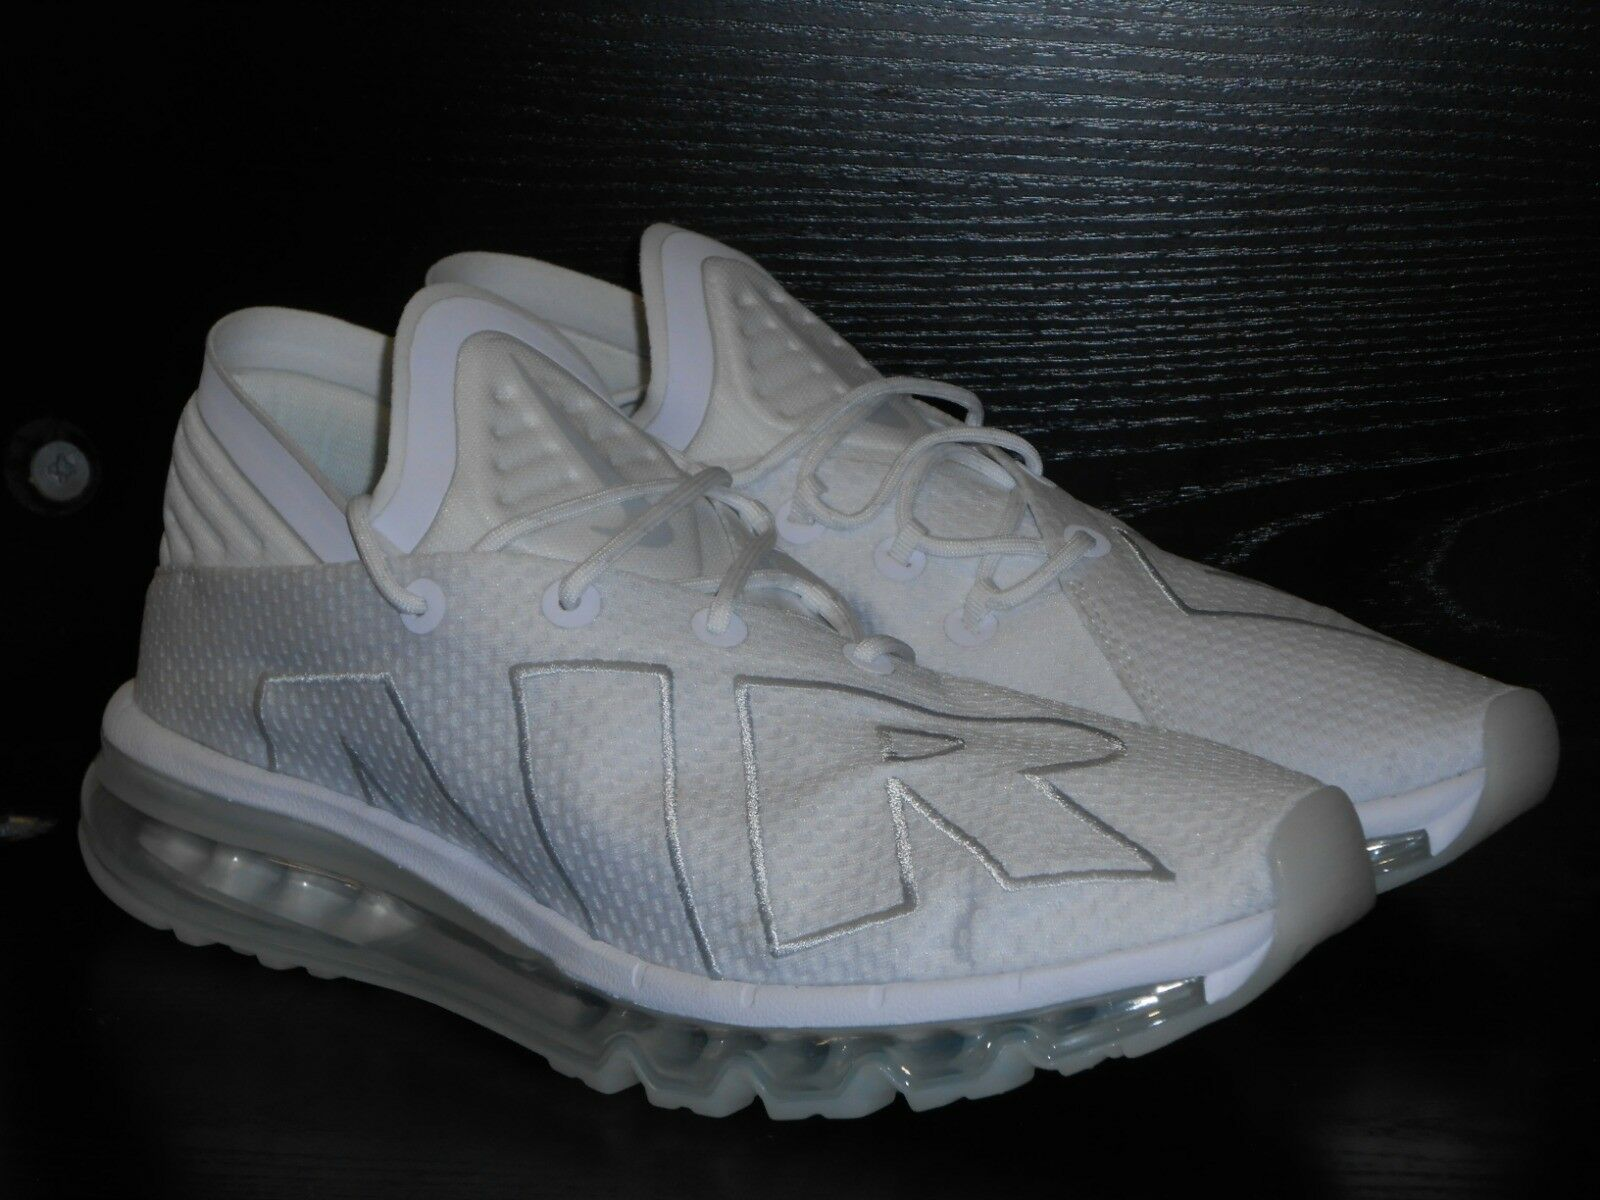 best service e491f 39bcb Nike air max flair Uomo correndo trainer scarpe bianco bianco bianco e 8,5  7692ae